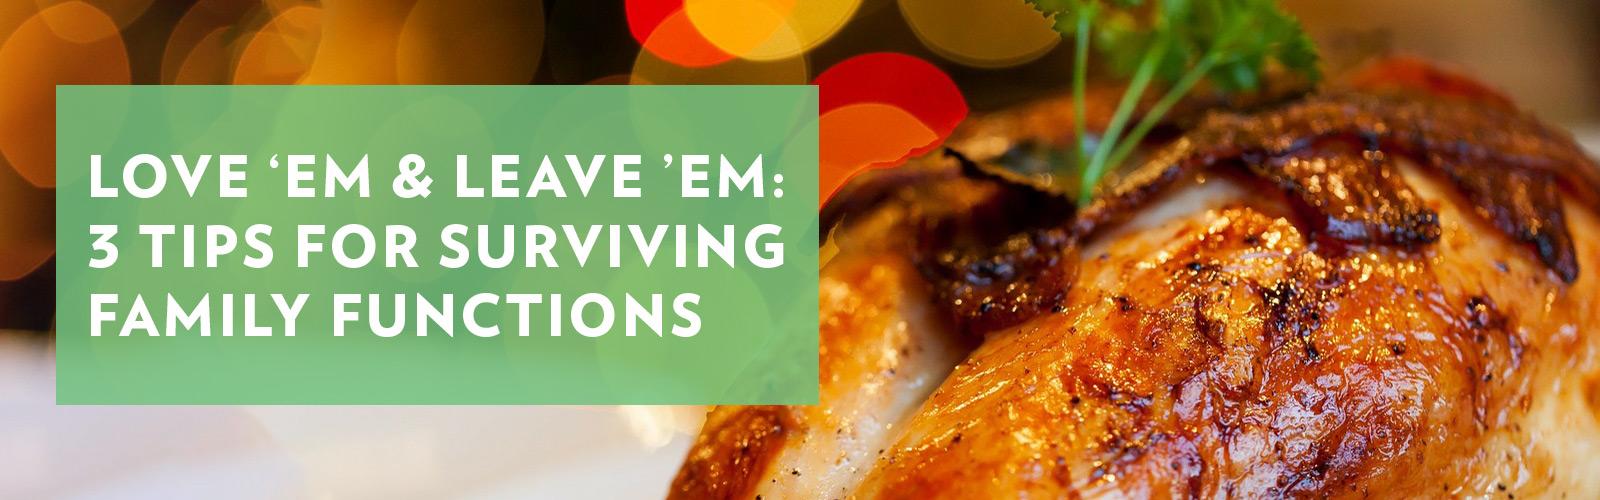 Love Em & Leave Em : 3 Tips for Surviving Family Functions